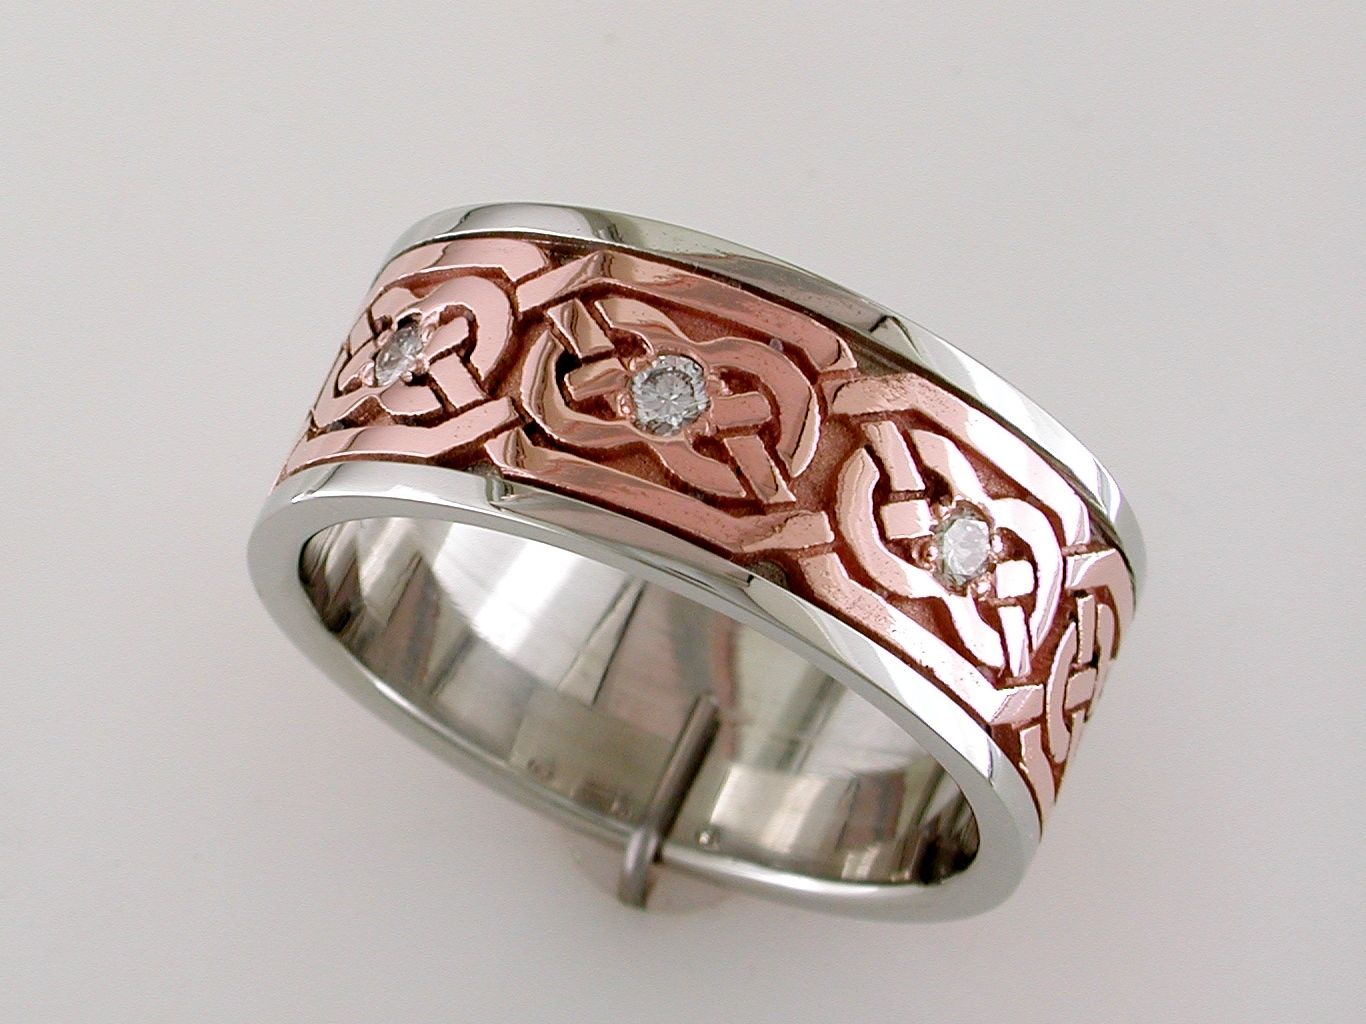 Celtic gents wedding ring made of 14k rose white gold